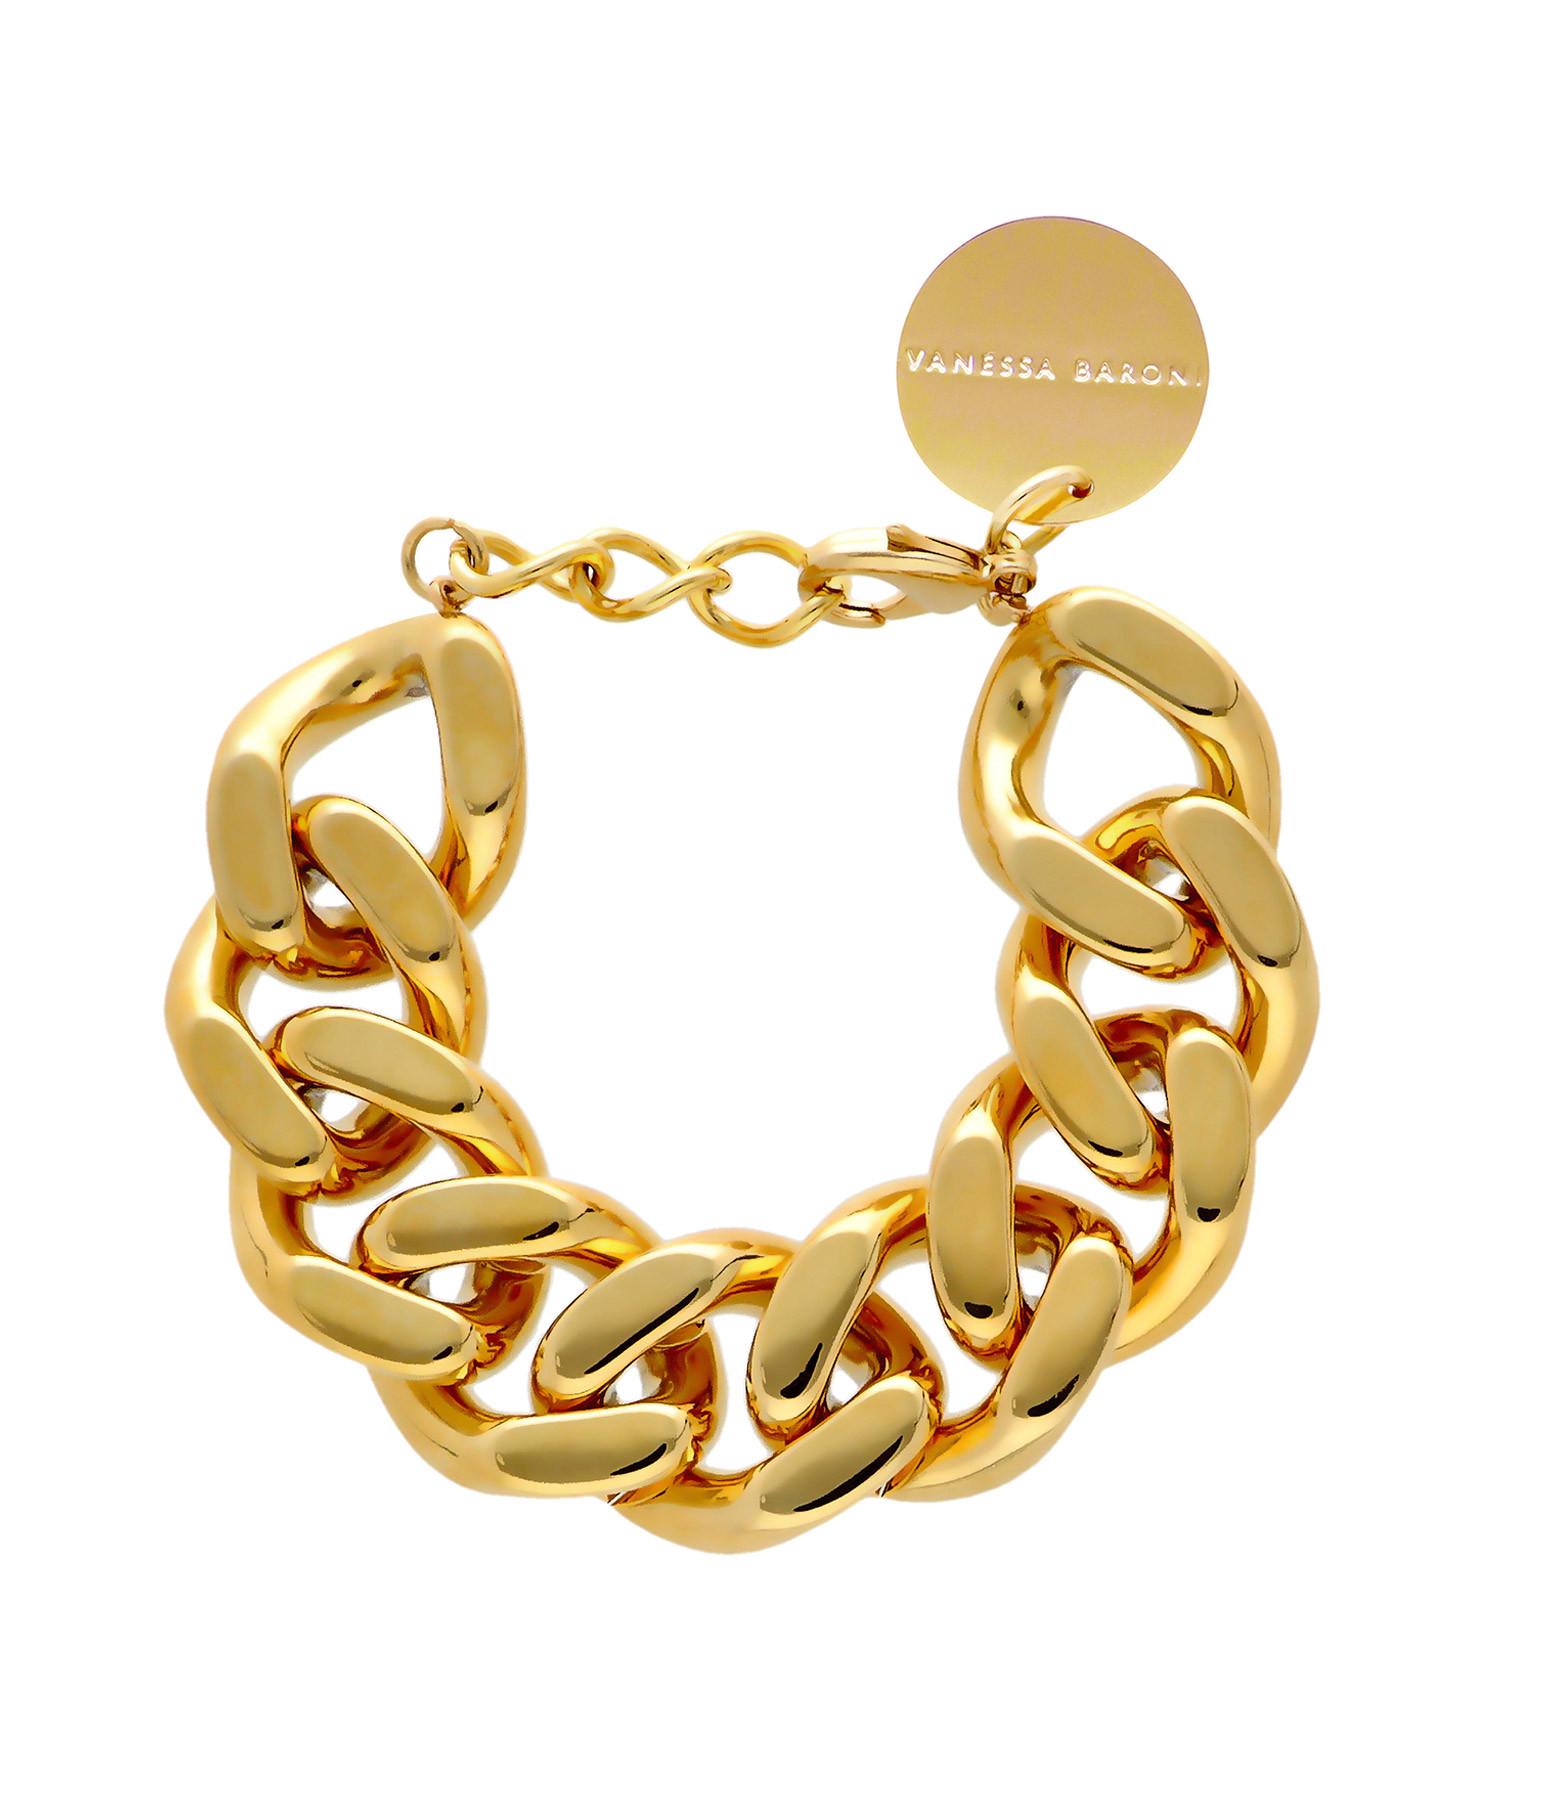 VANESSA BARONI - Bracelet Flat Gold